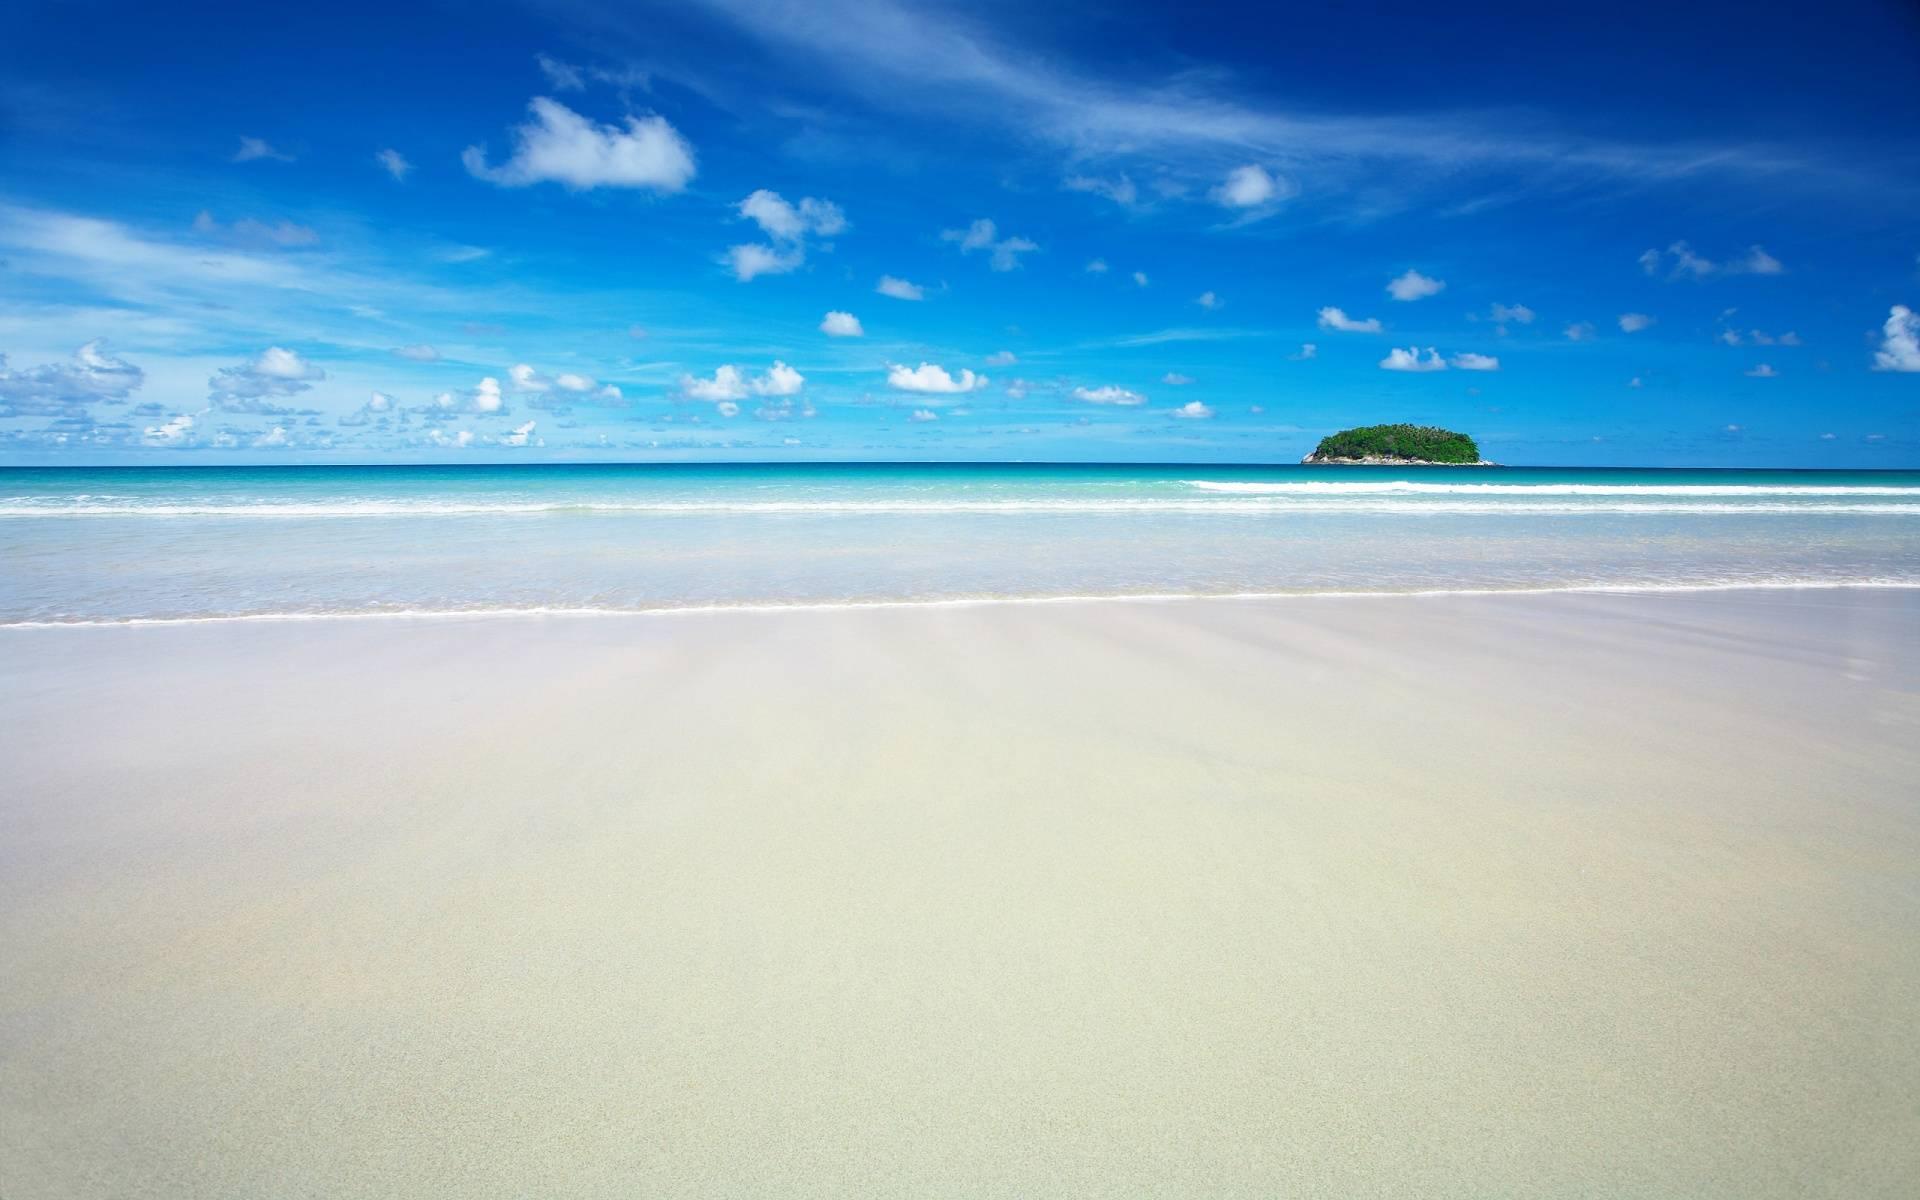 desktop spring theme beach ocean themes download desktop wallpapers